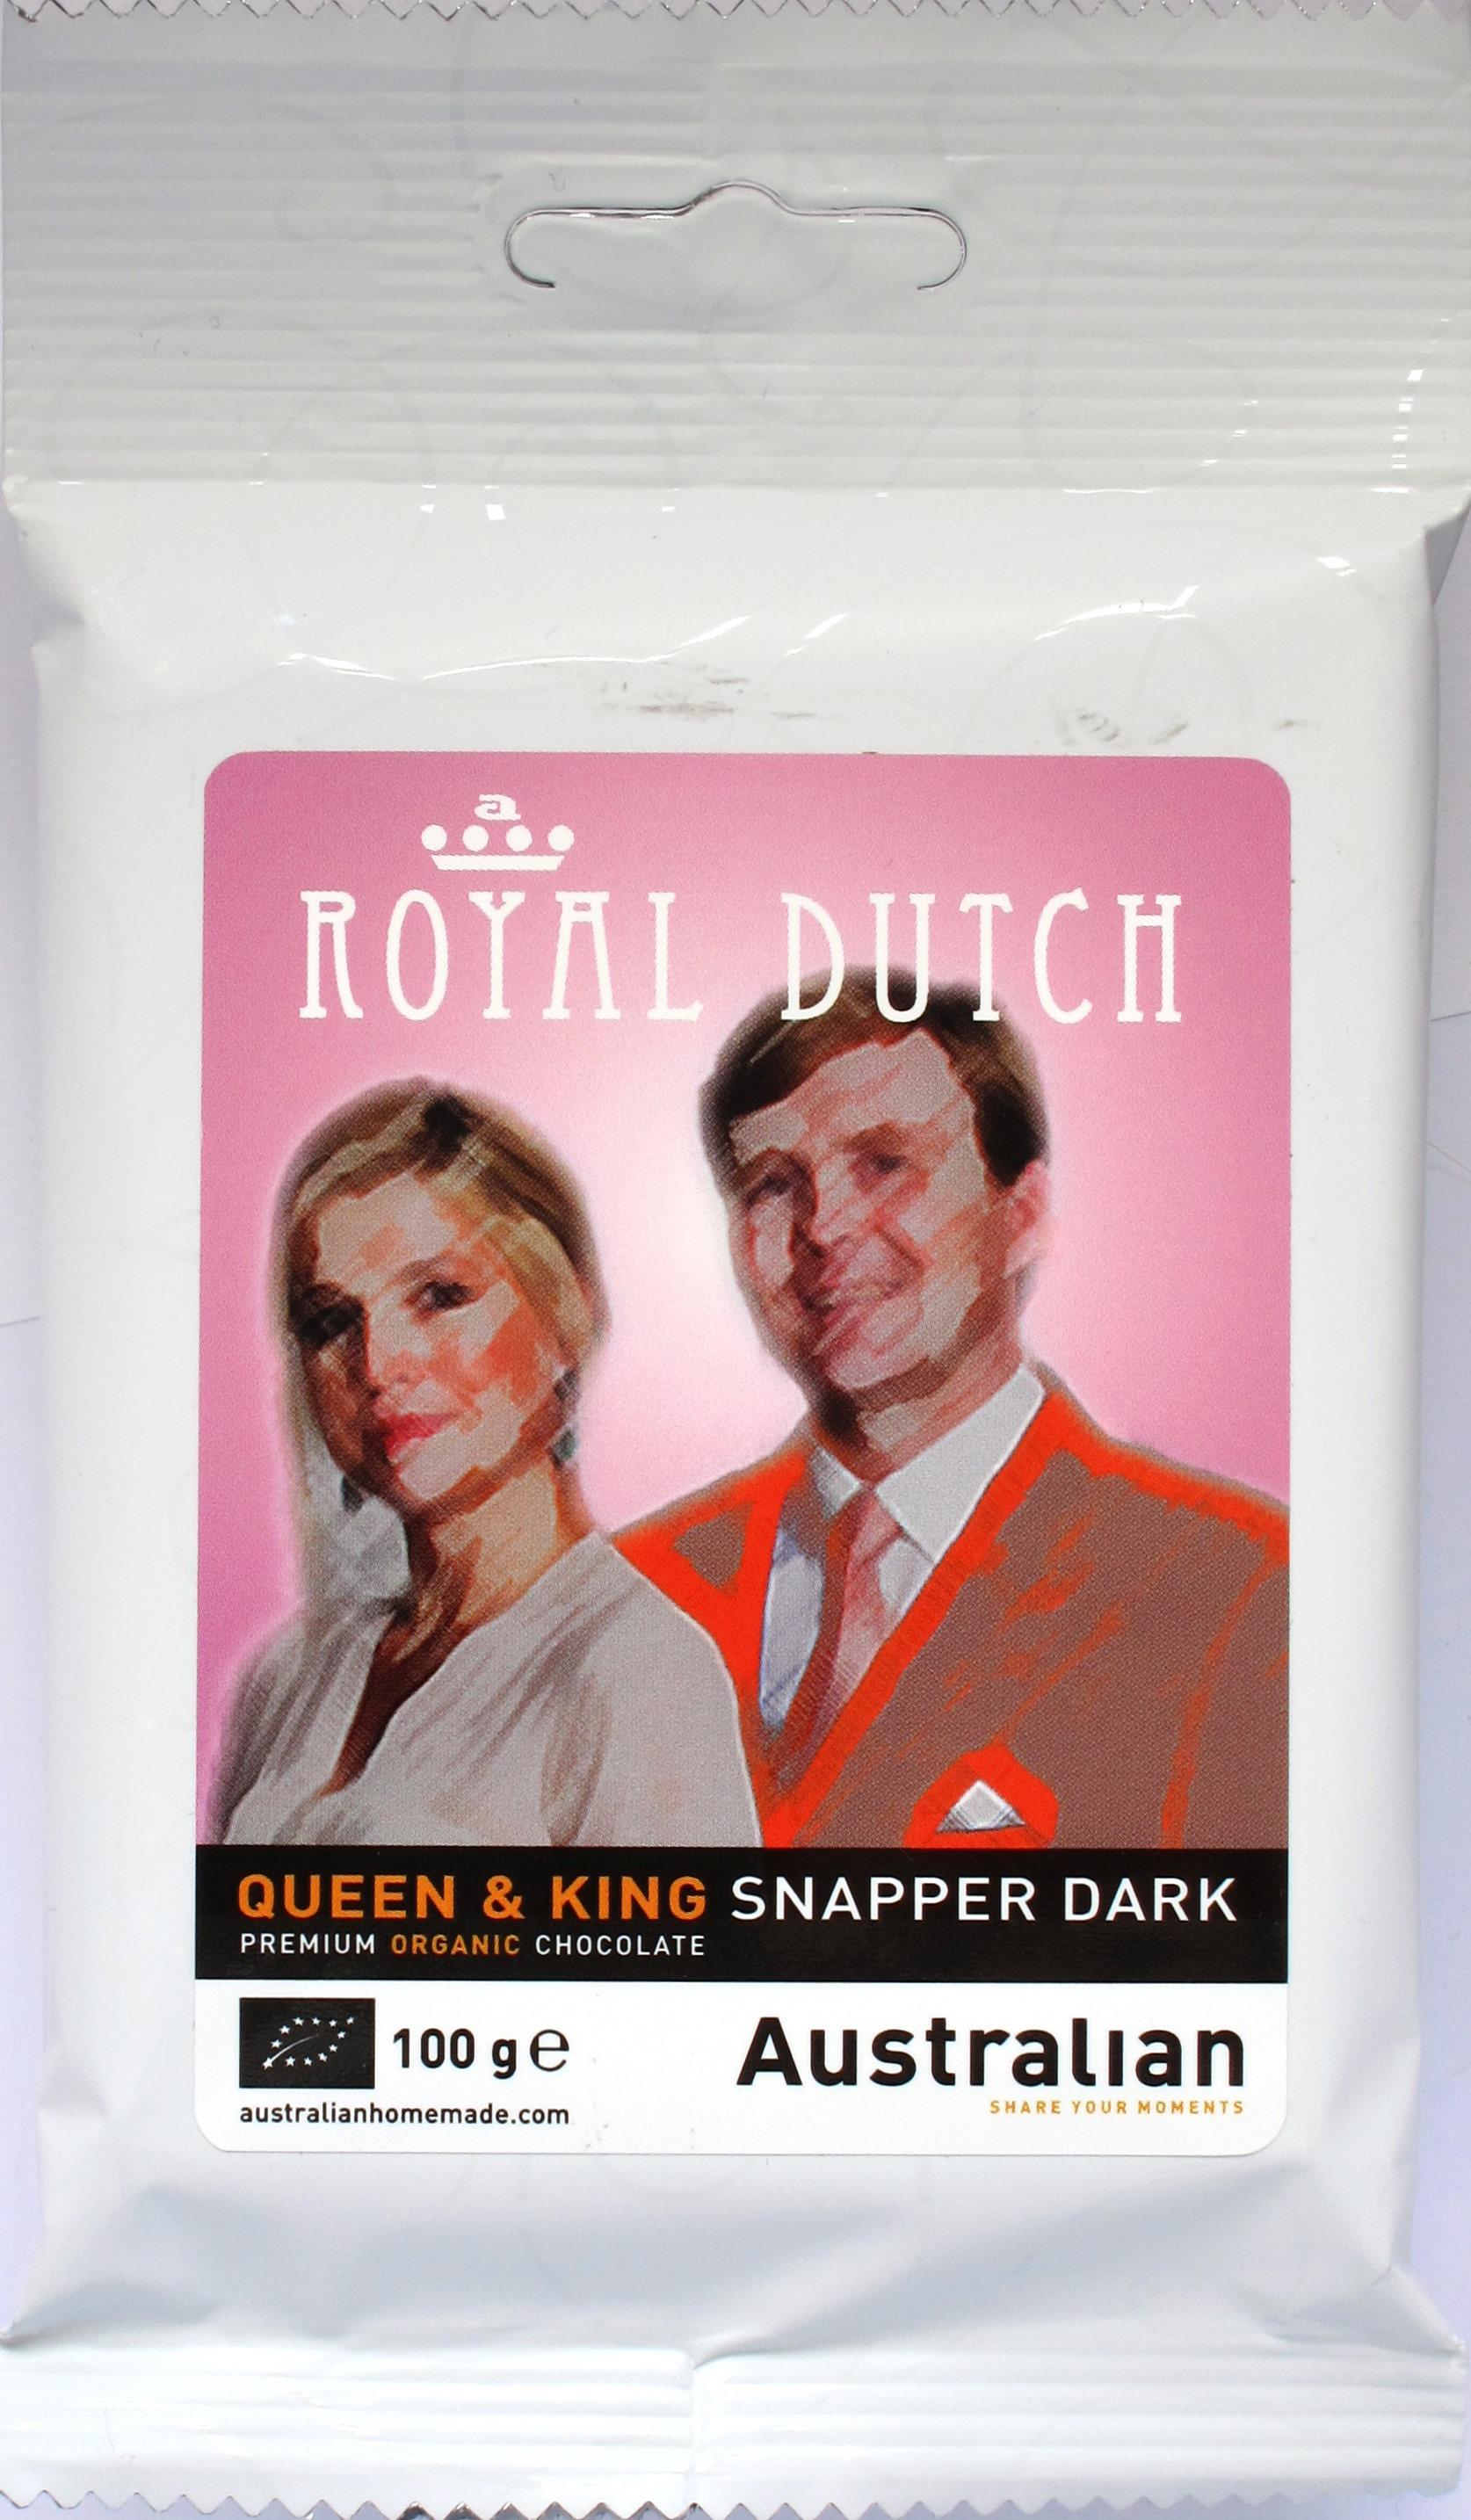 Australian Homemade Royal Dutch 73% Schokolade